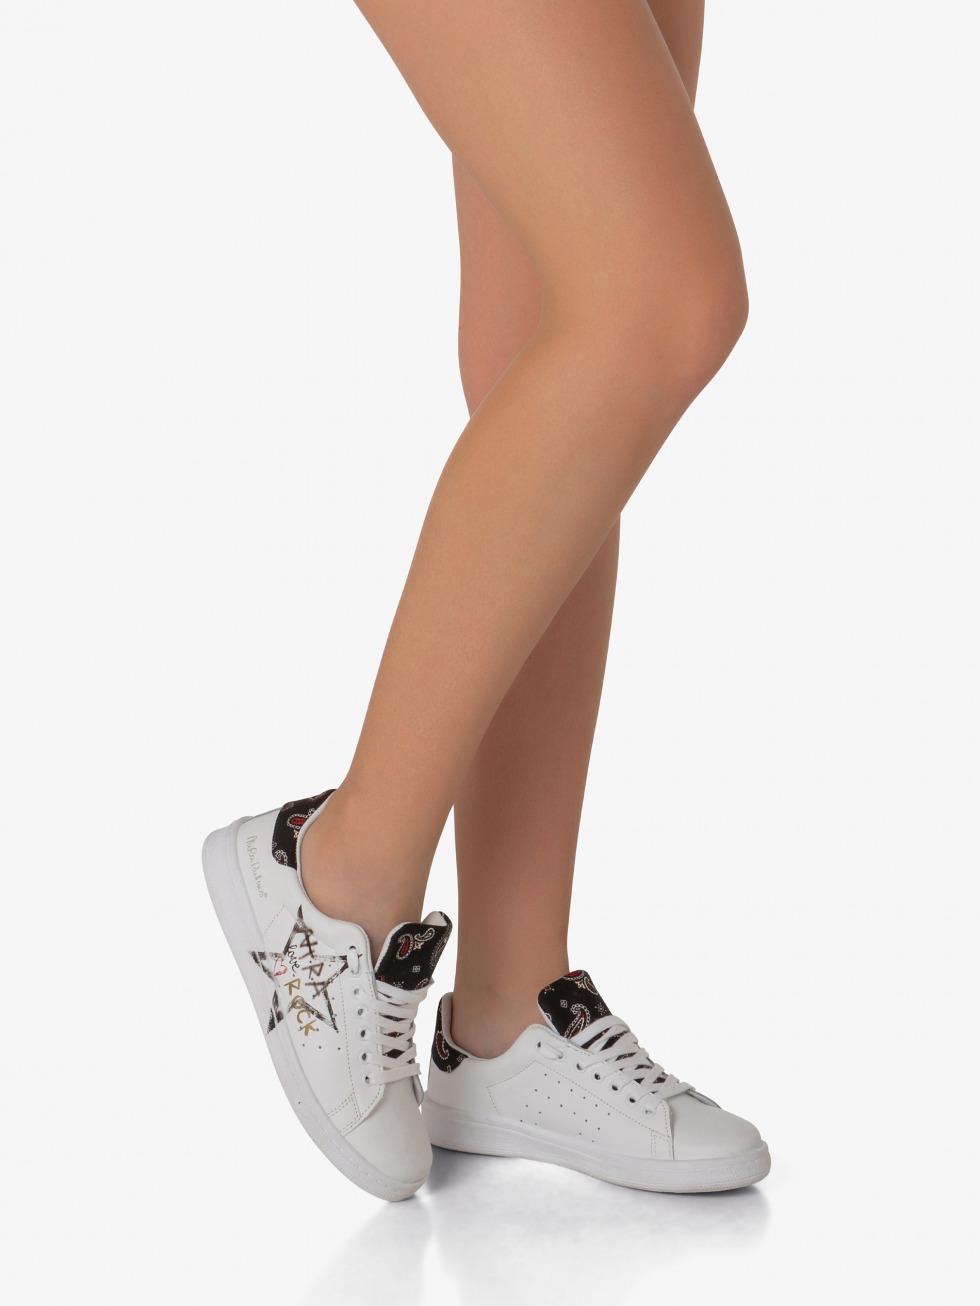 Daiquiri Sneakers - Black Rock Heart